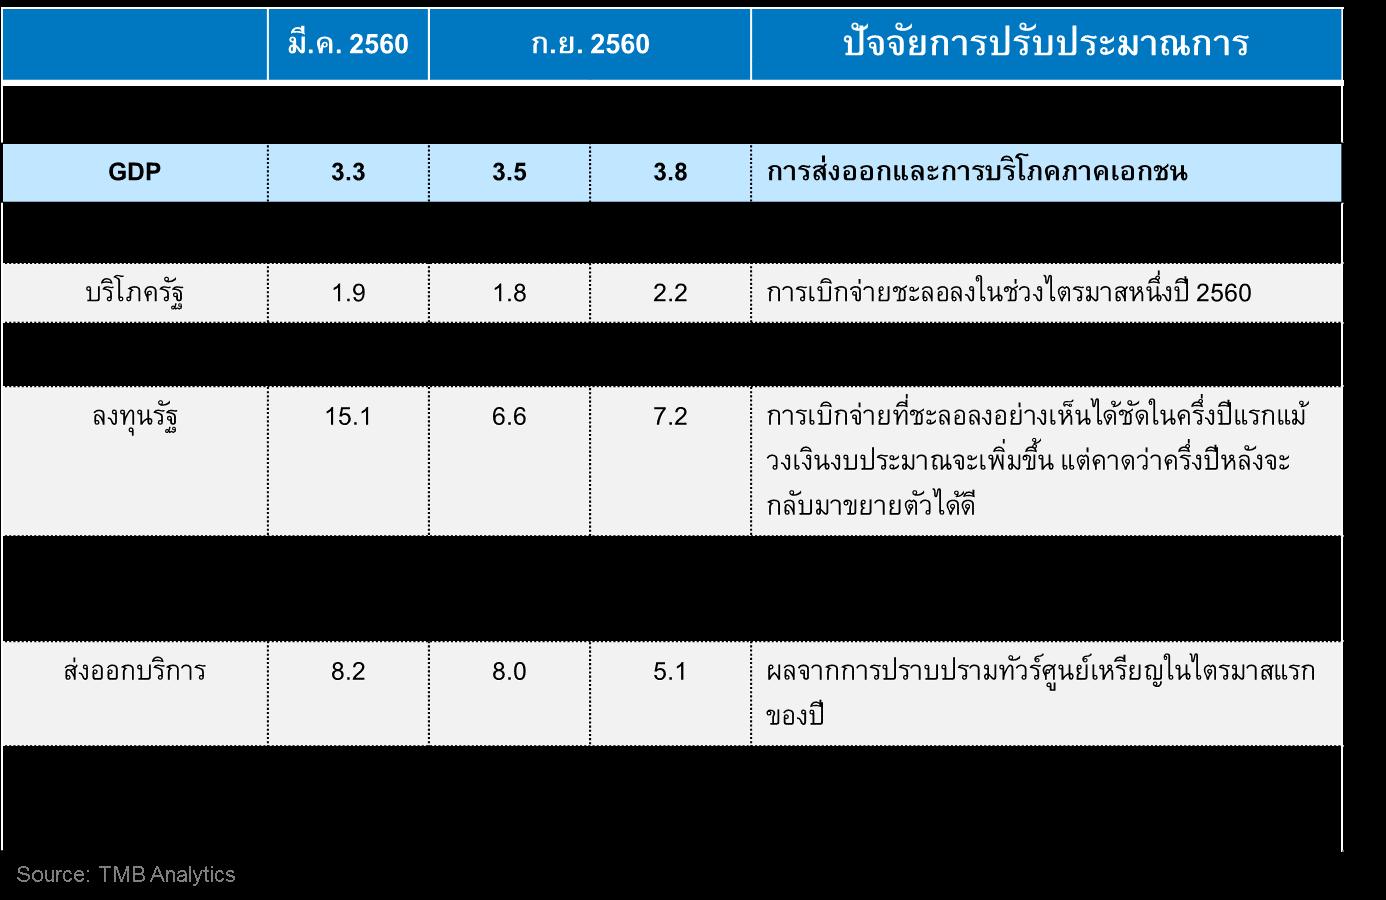 TMB Analytics ปรับประมาณการการเติบโตของเศรษฐกิจไทยปี 2560 เพิ่มขึ้นเป็น 3.5% จากเดิมคาดการณ์ที่ 3.3%